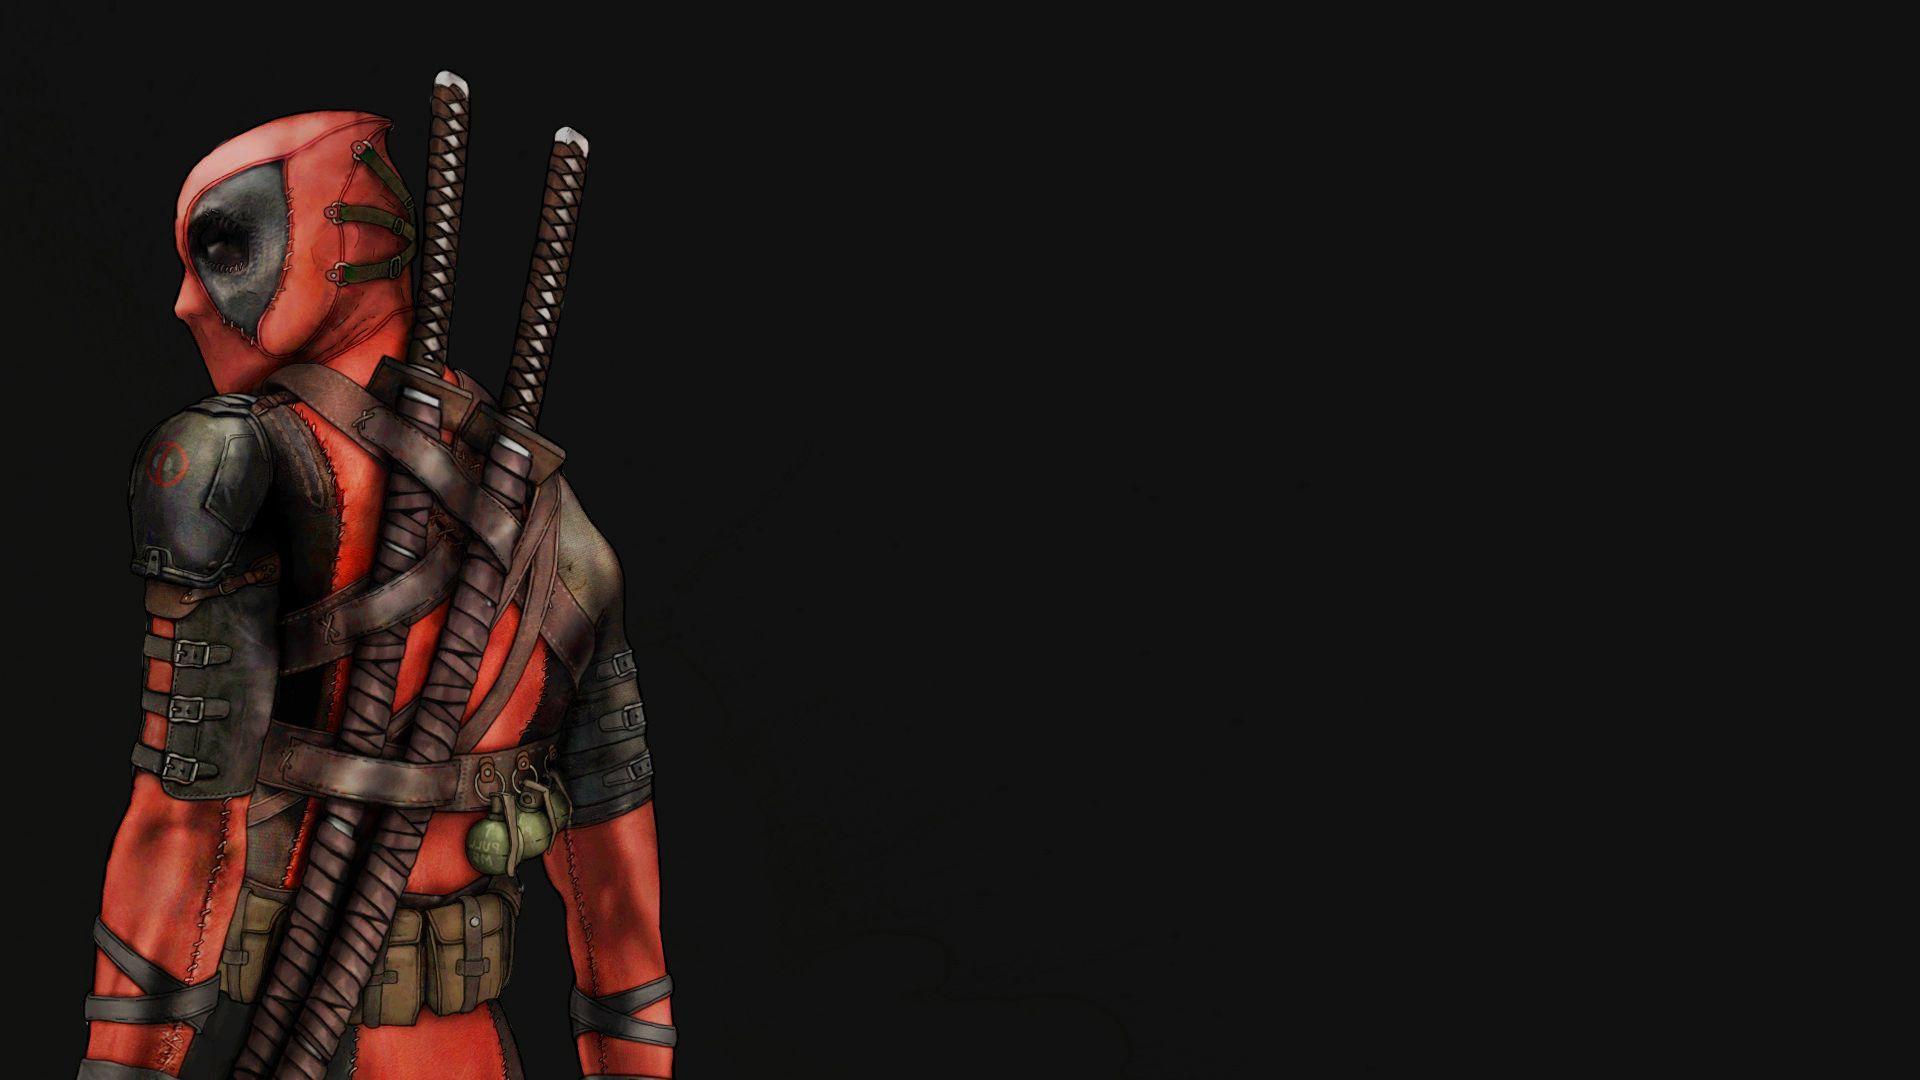 3d Deadpool Wallpapers Top Free 3d Deadpool Backgrounds